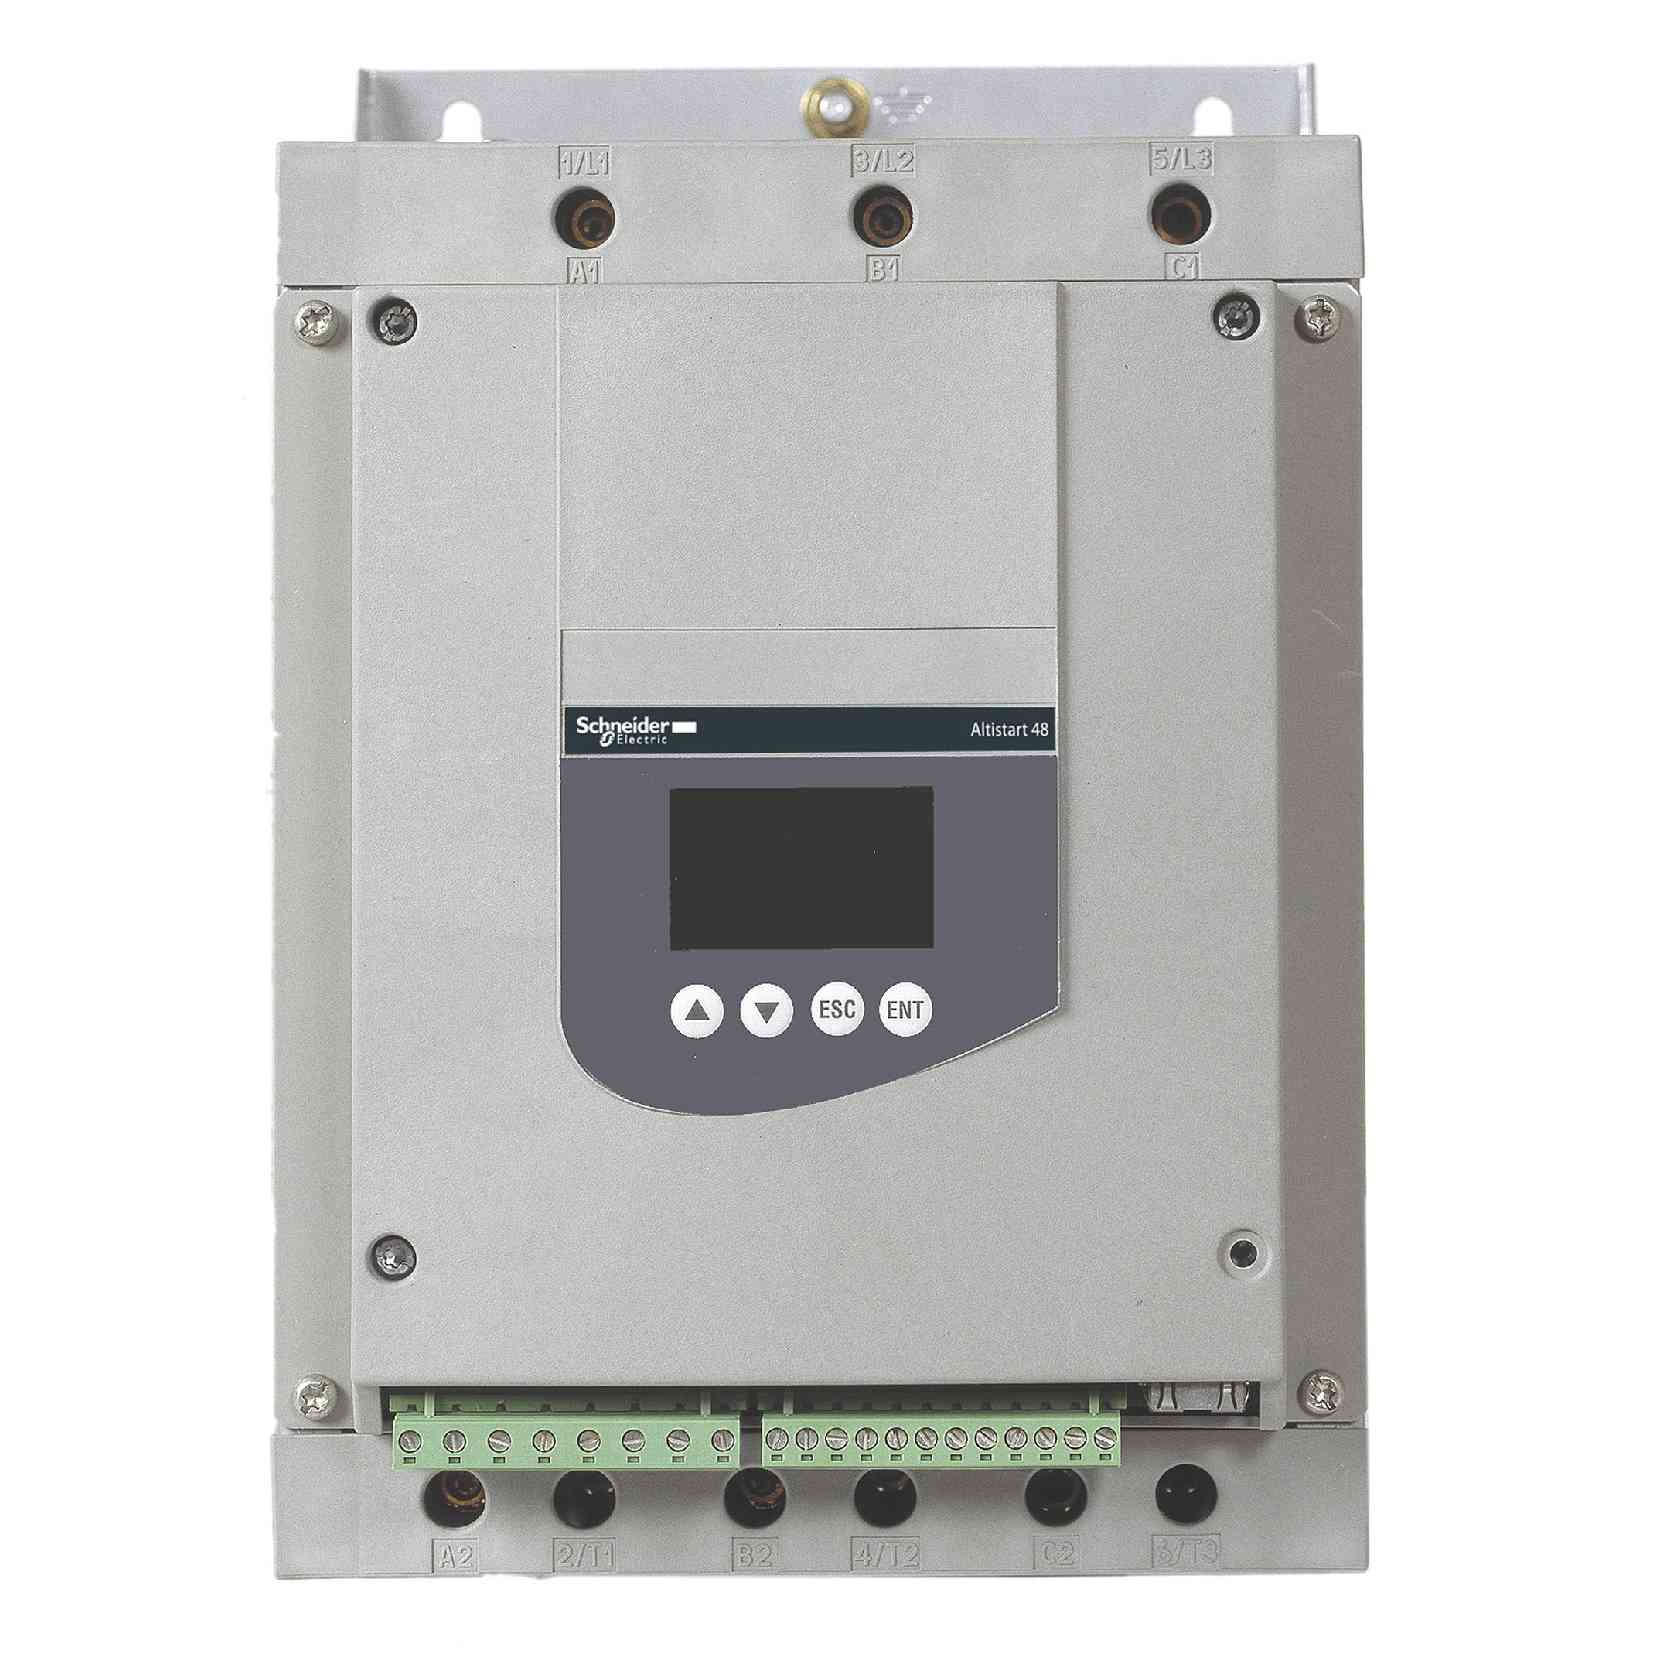 Mehki zaganjalnik za asinhroni motor - ATS48 - 69 A - 230 do 415 V - 15 do 55 kW